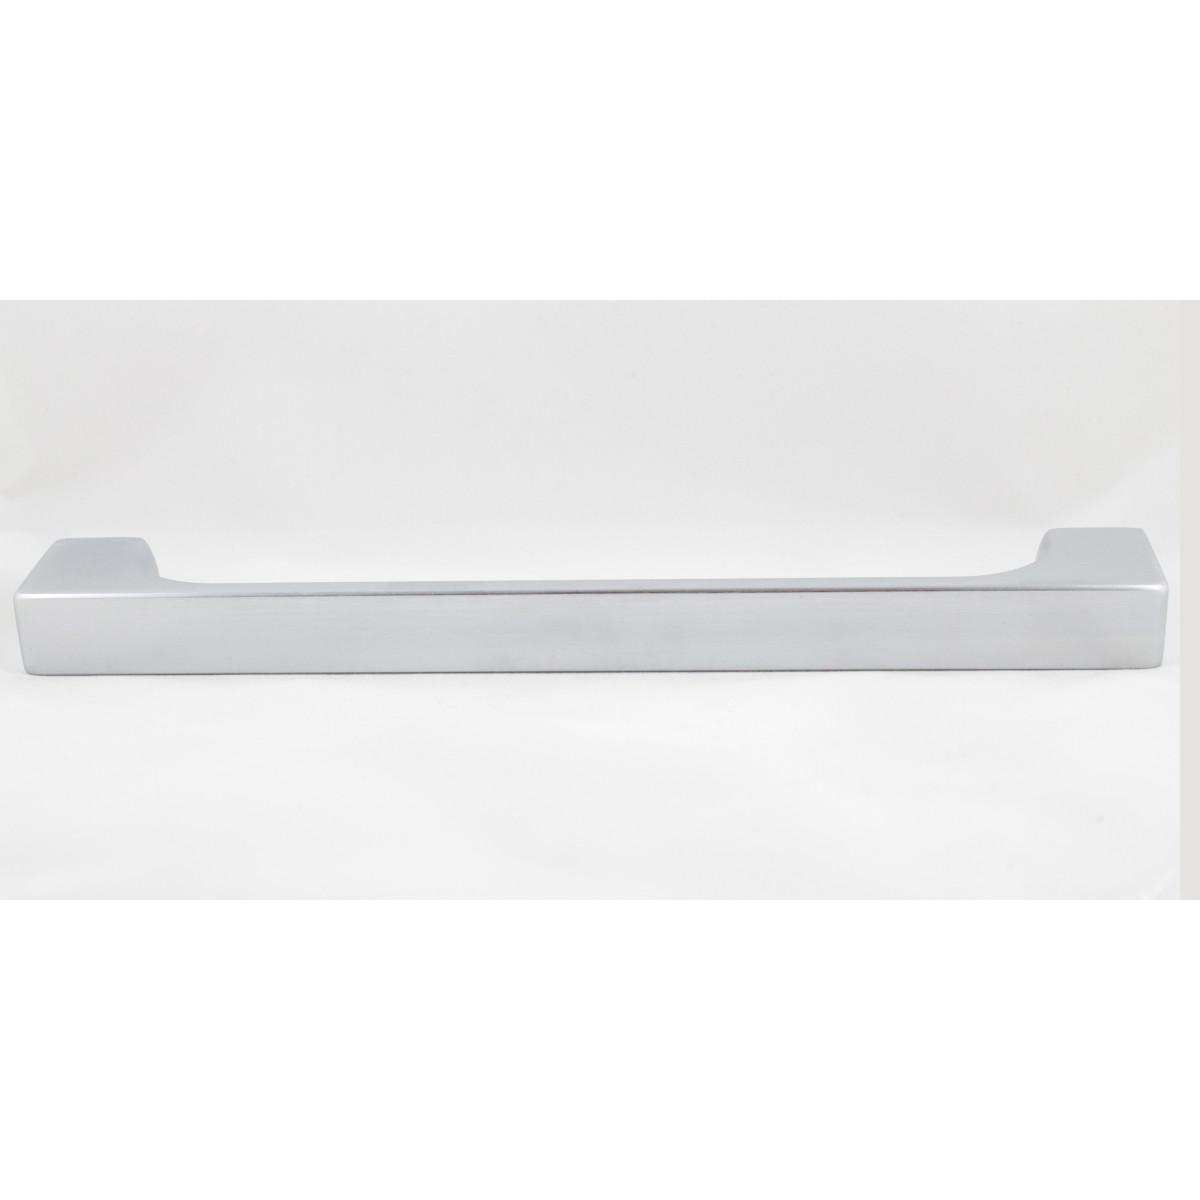 Ручка-Скоба Modda 224 Латунь Хром Pizza-830-88-224